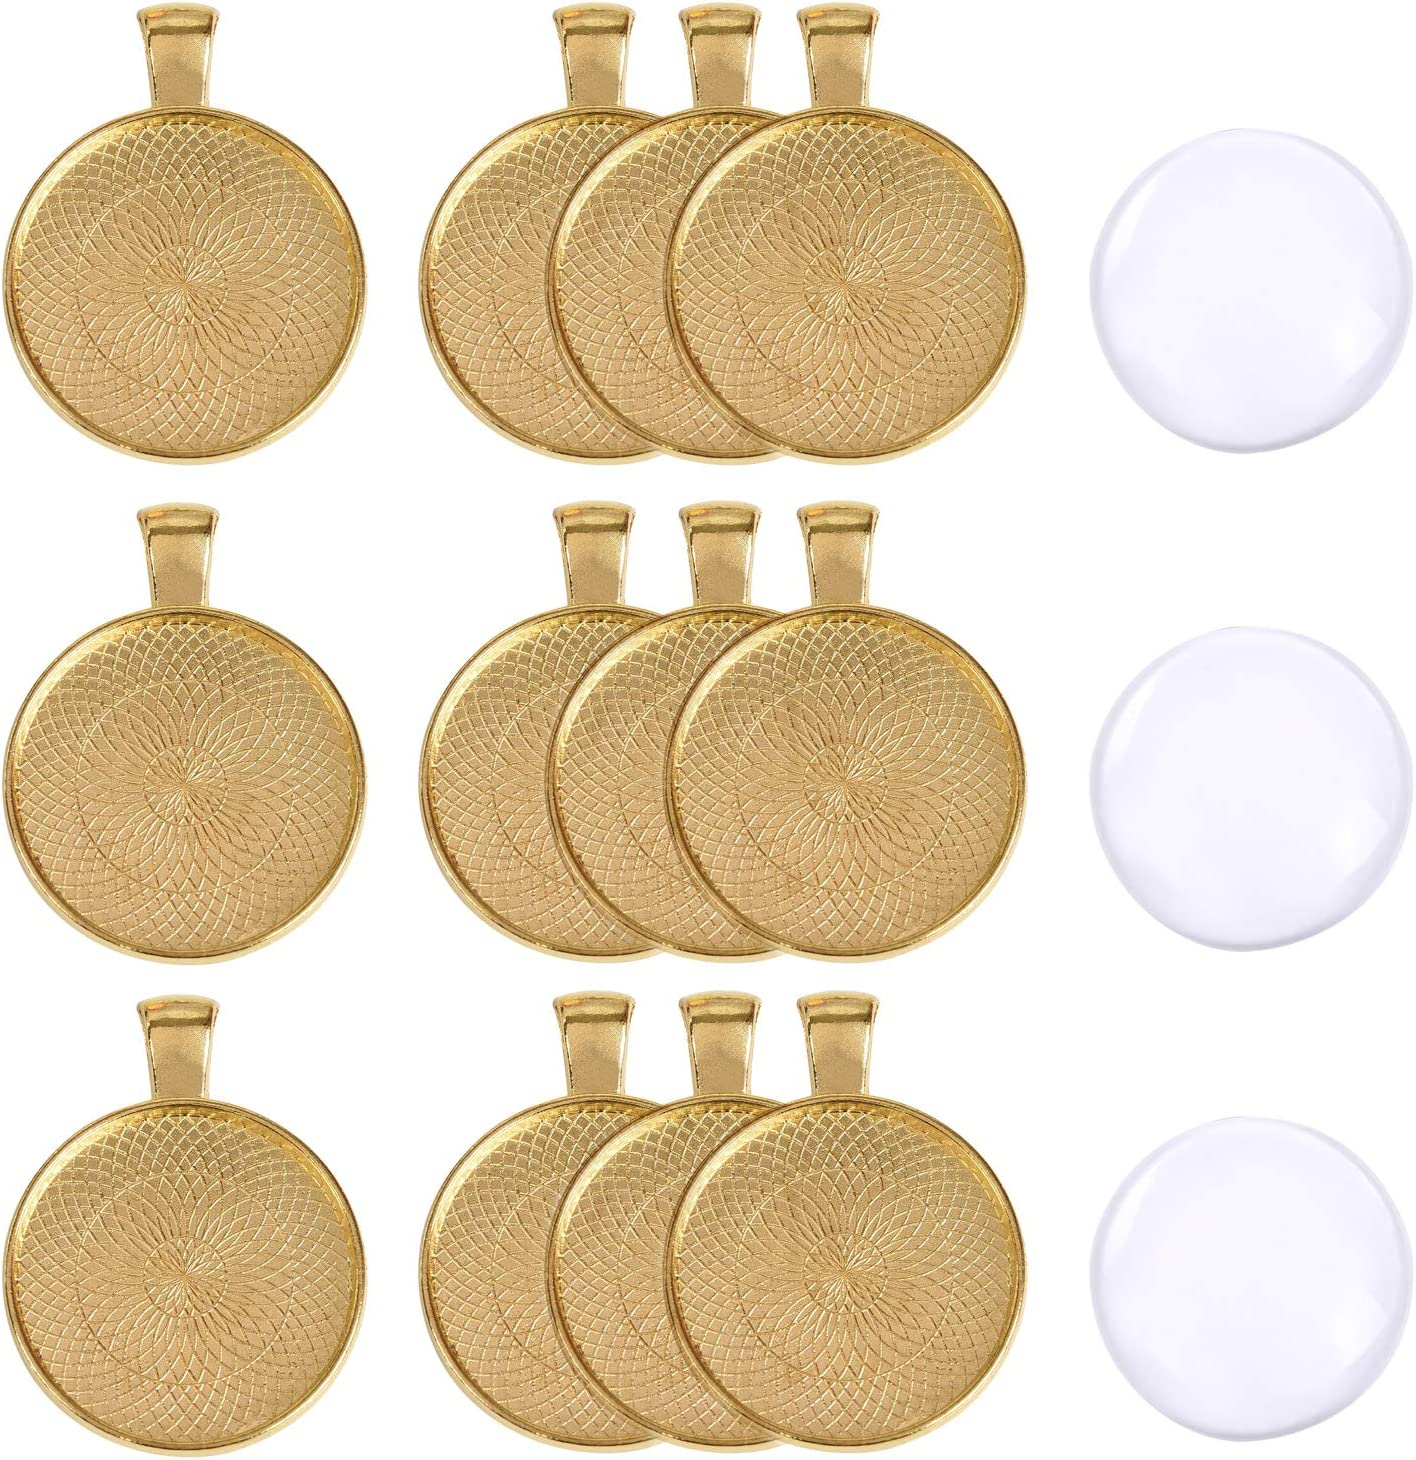 10PCS 24K Gold Color Brass Oval Lace Trays Bezels Base Cabochon Beads Settings